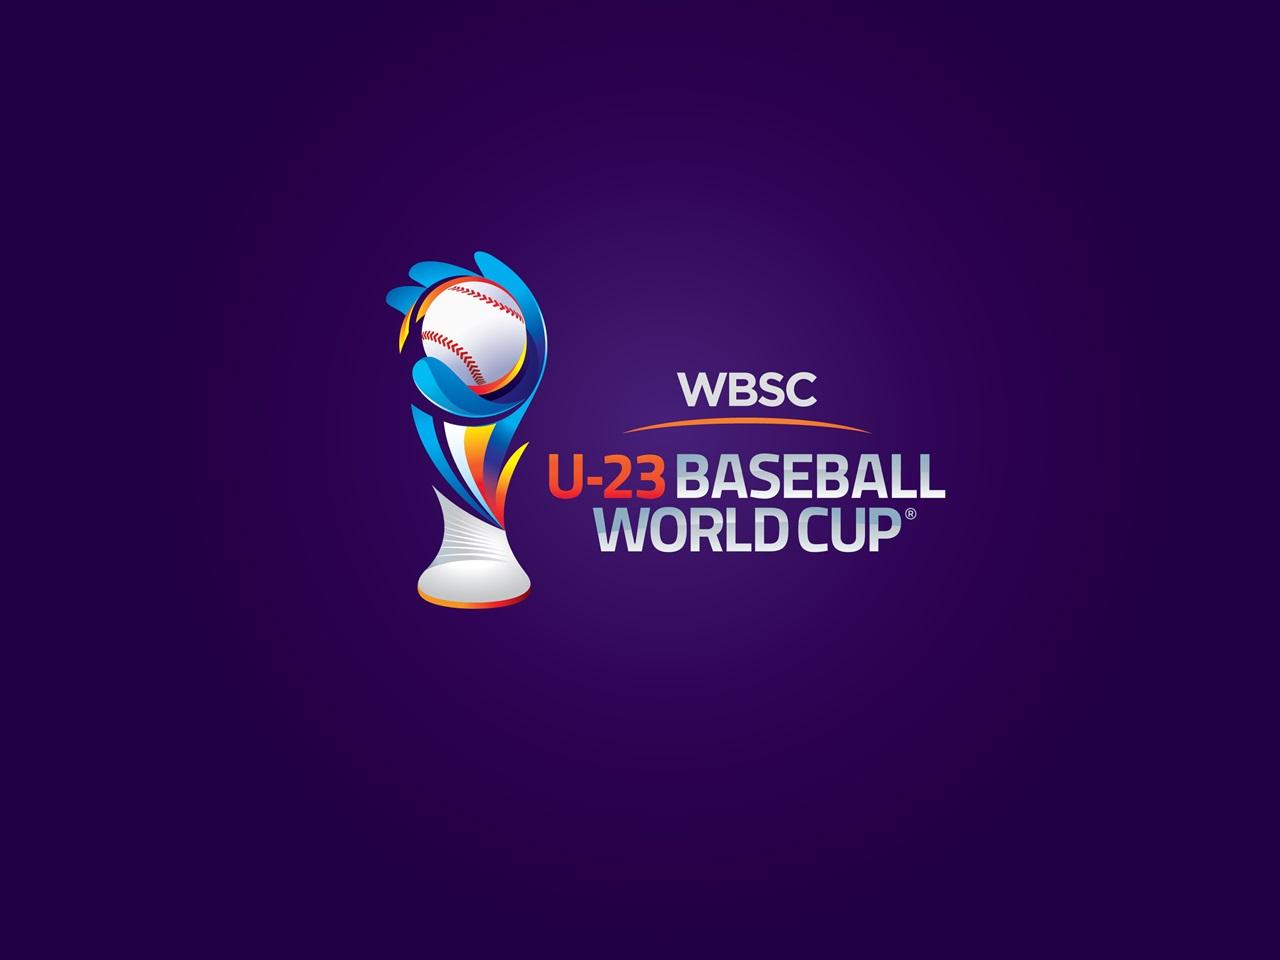 WBSC U-23 Baseball World Cup 2016 - Official Emblem (web)